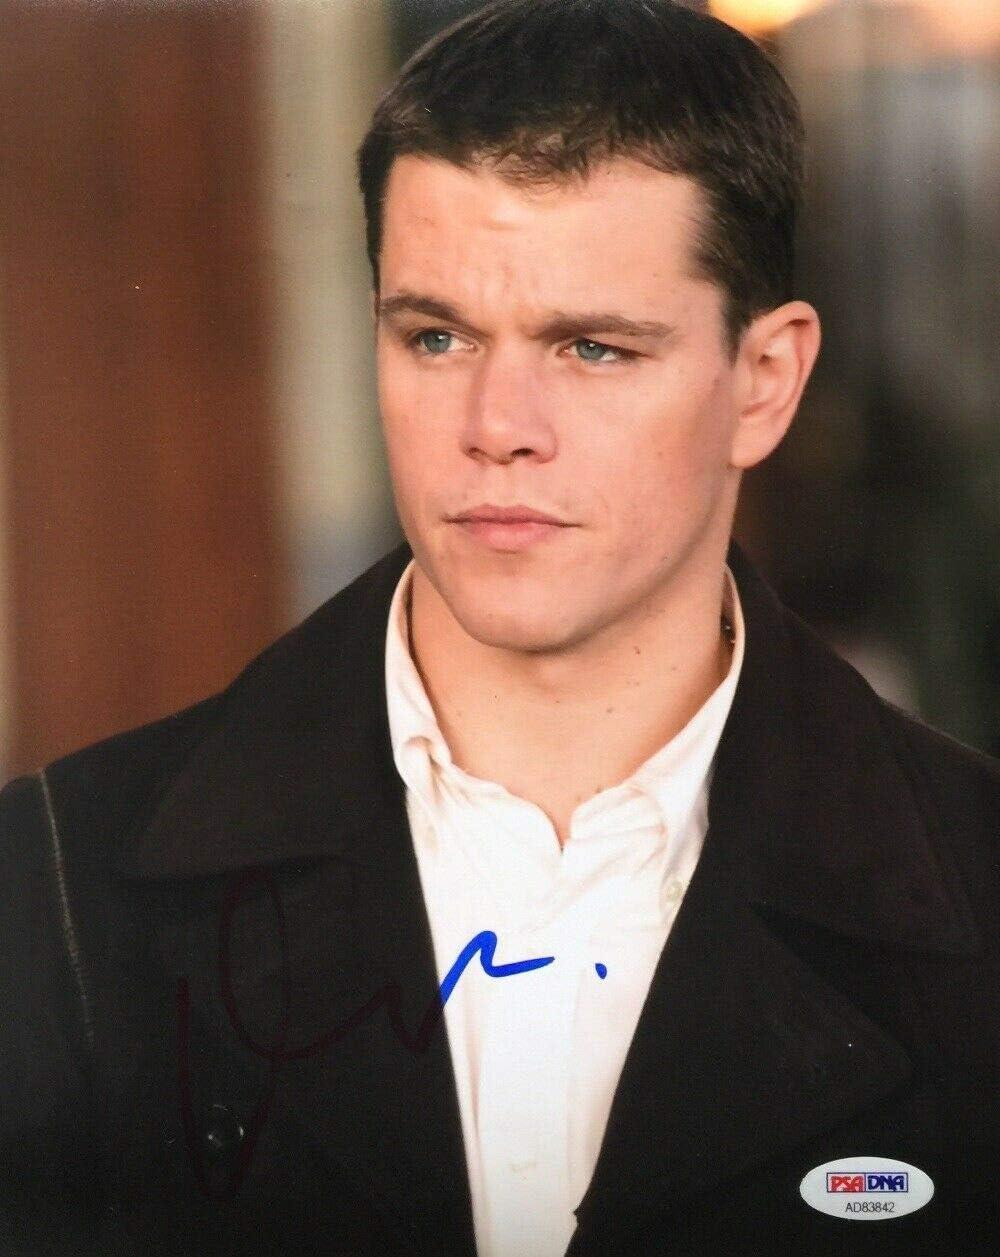 Matt Damon Autographed Signed PSA 8x10 AD83842 Dedication Photo Direct sale of manufacturer